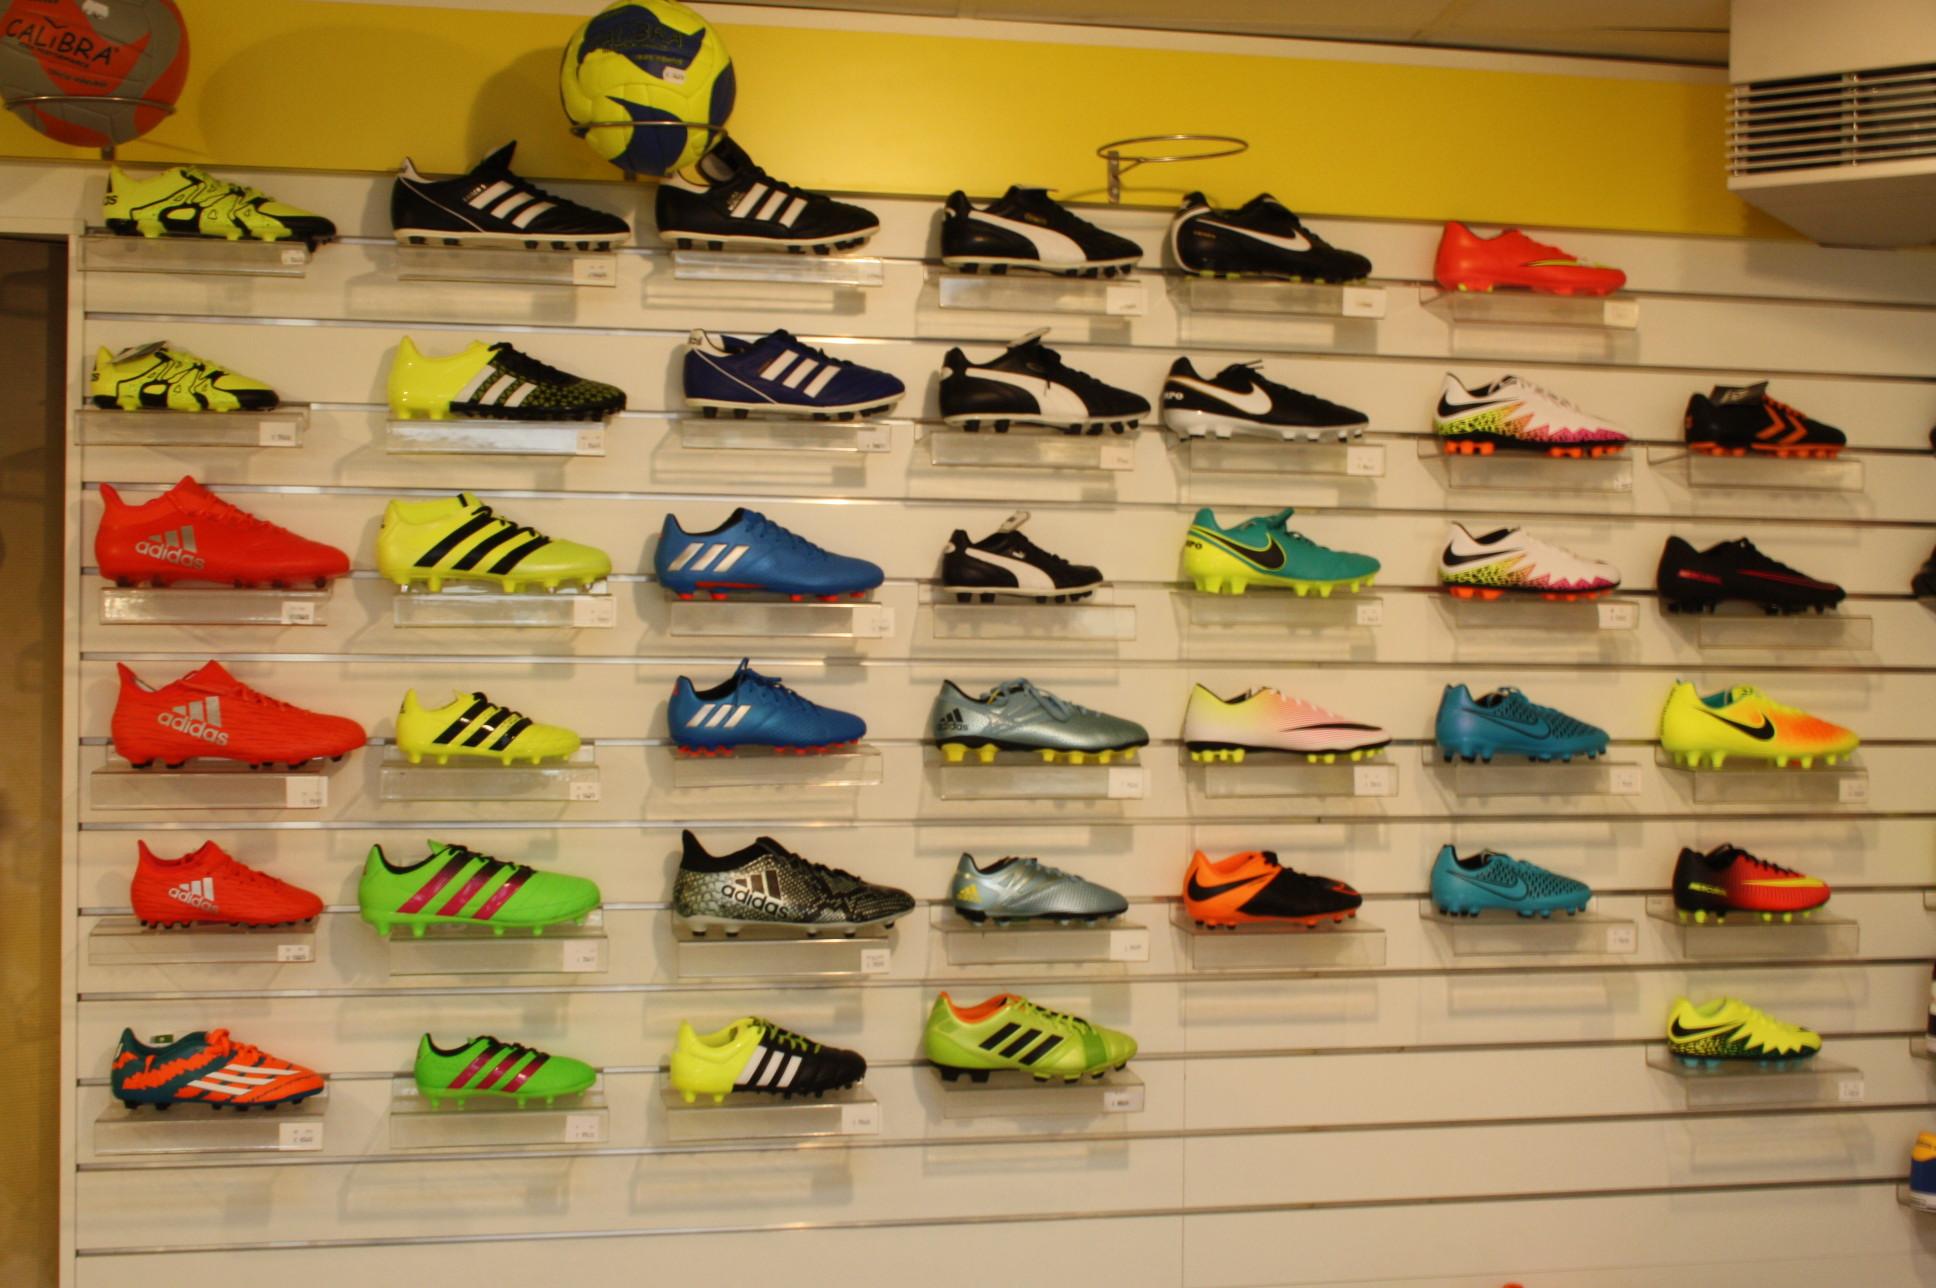 Dwars schoen en sportmode Nike: voetbalschoen Mercurial